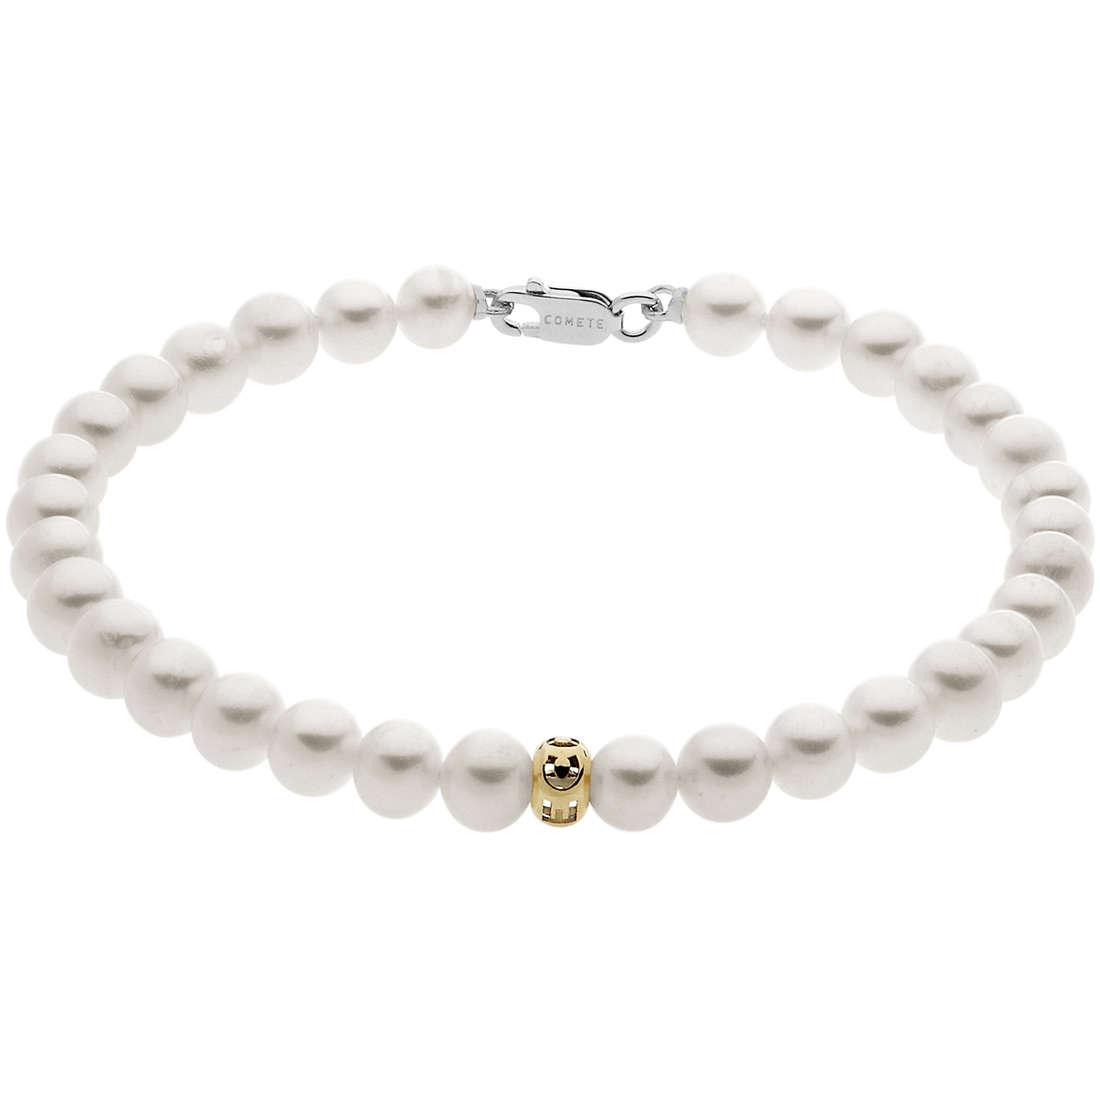 bracelet woman jewellery Comete Fantasie di perle BRQ 250 R